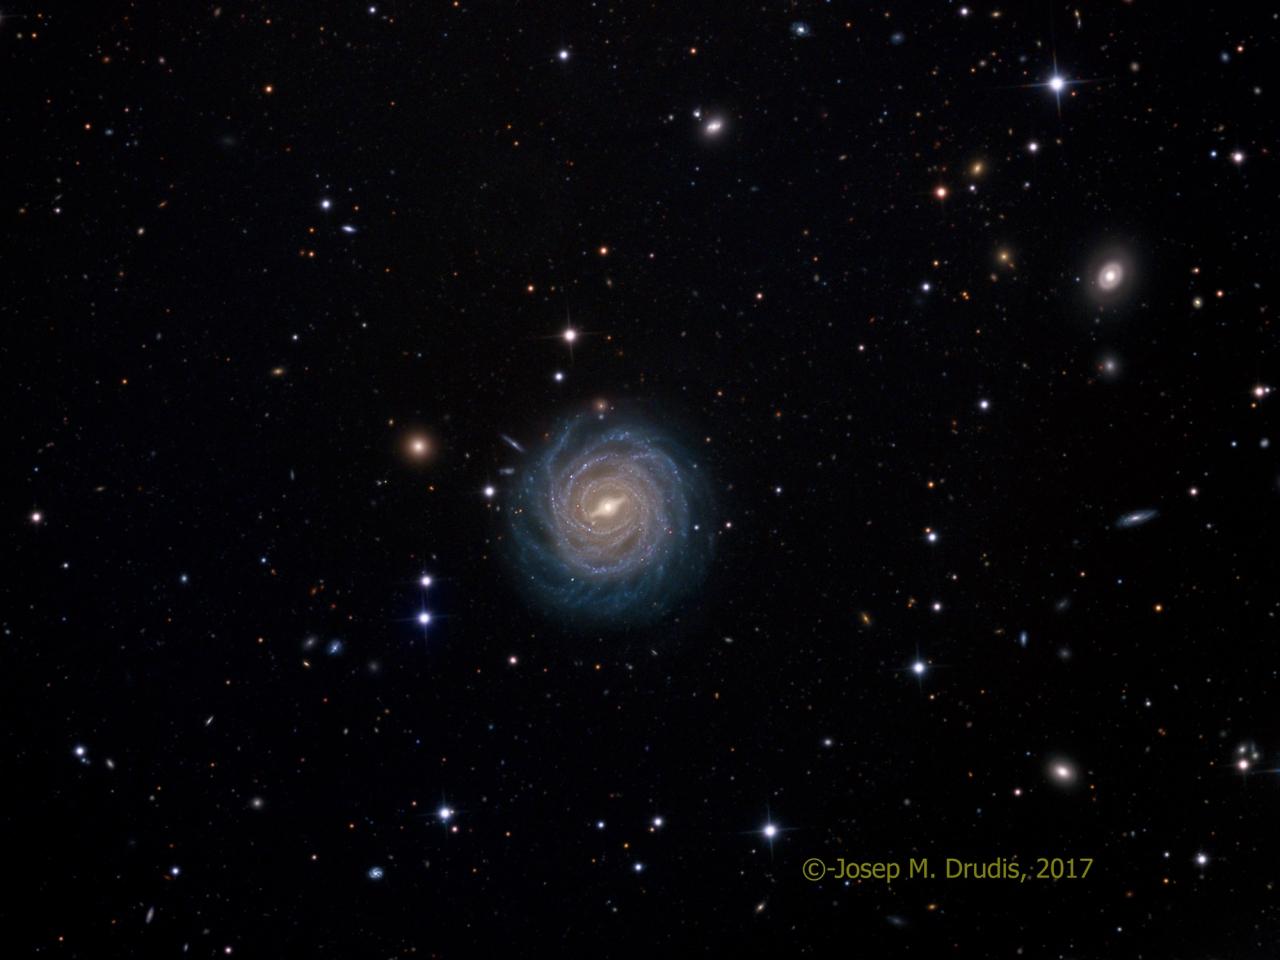 NGC521-LRGB-11-Final13-bCc